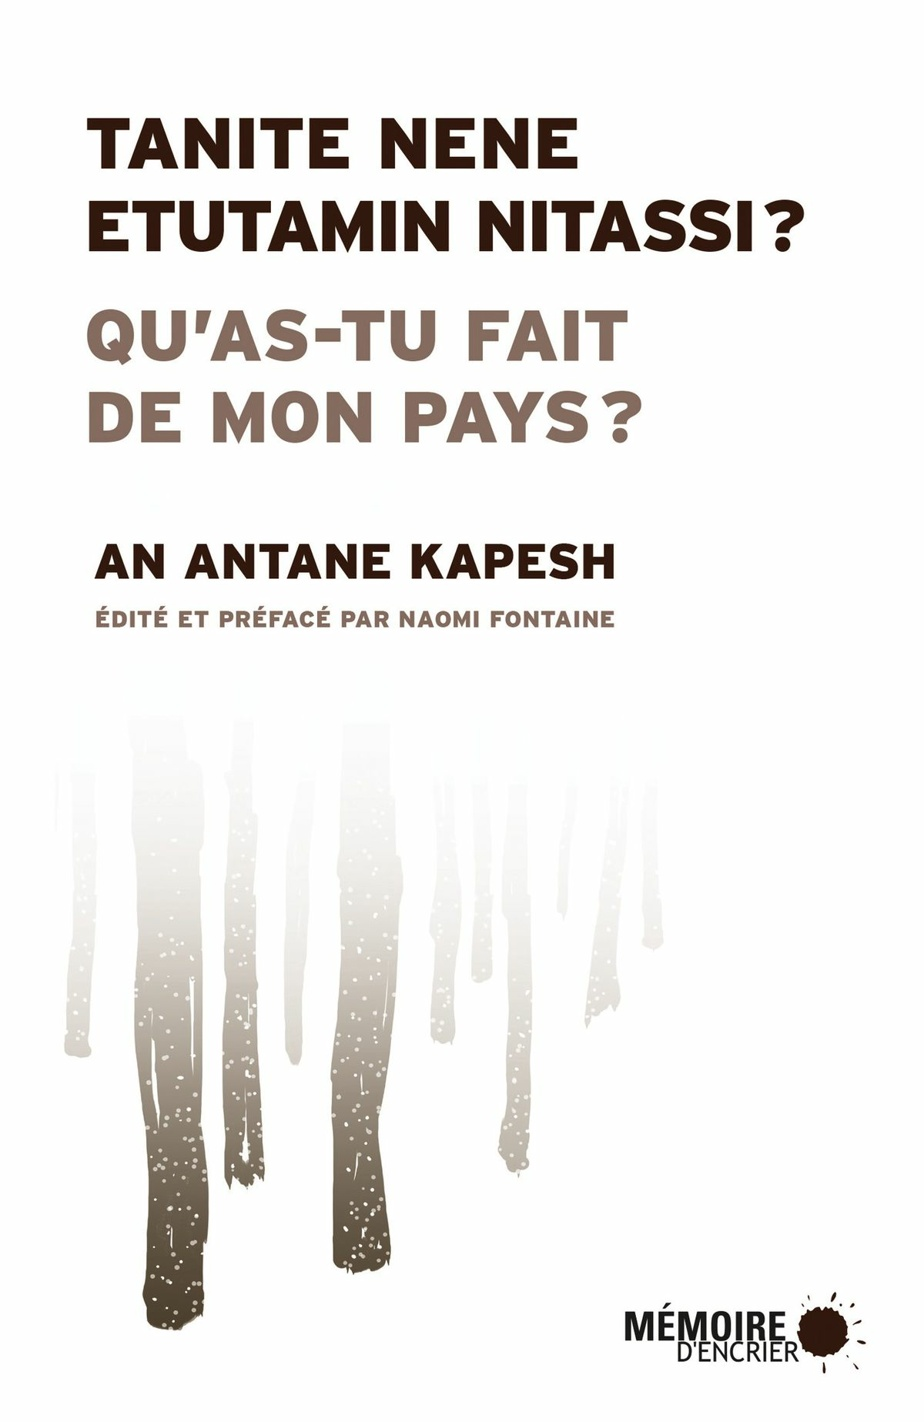 Tanite nene etutamin nitassi? / Qu'as-tu fait de mon pays?, d'An Antane Kapesh (Mémoire d'encrier)